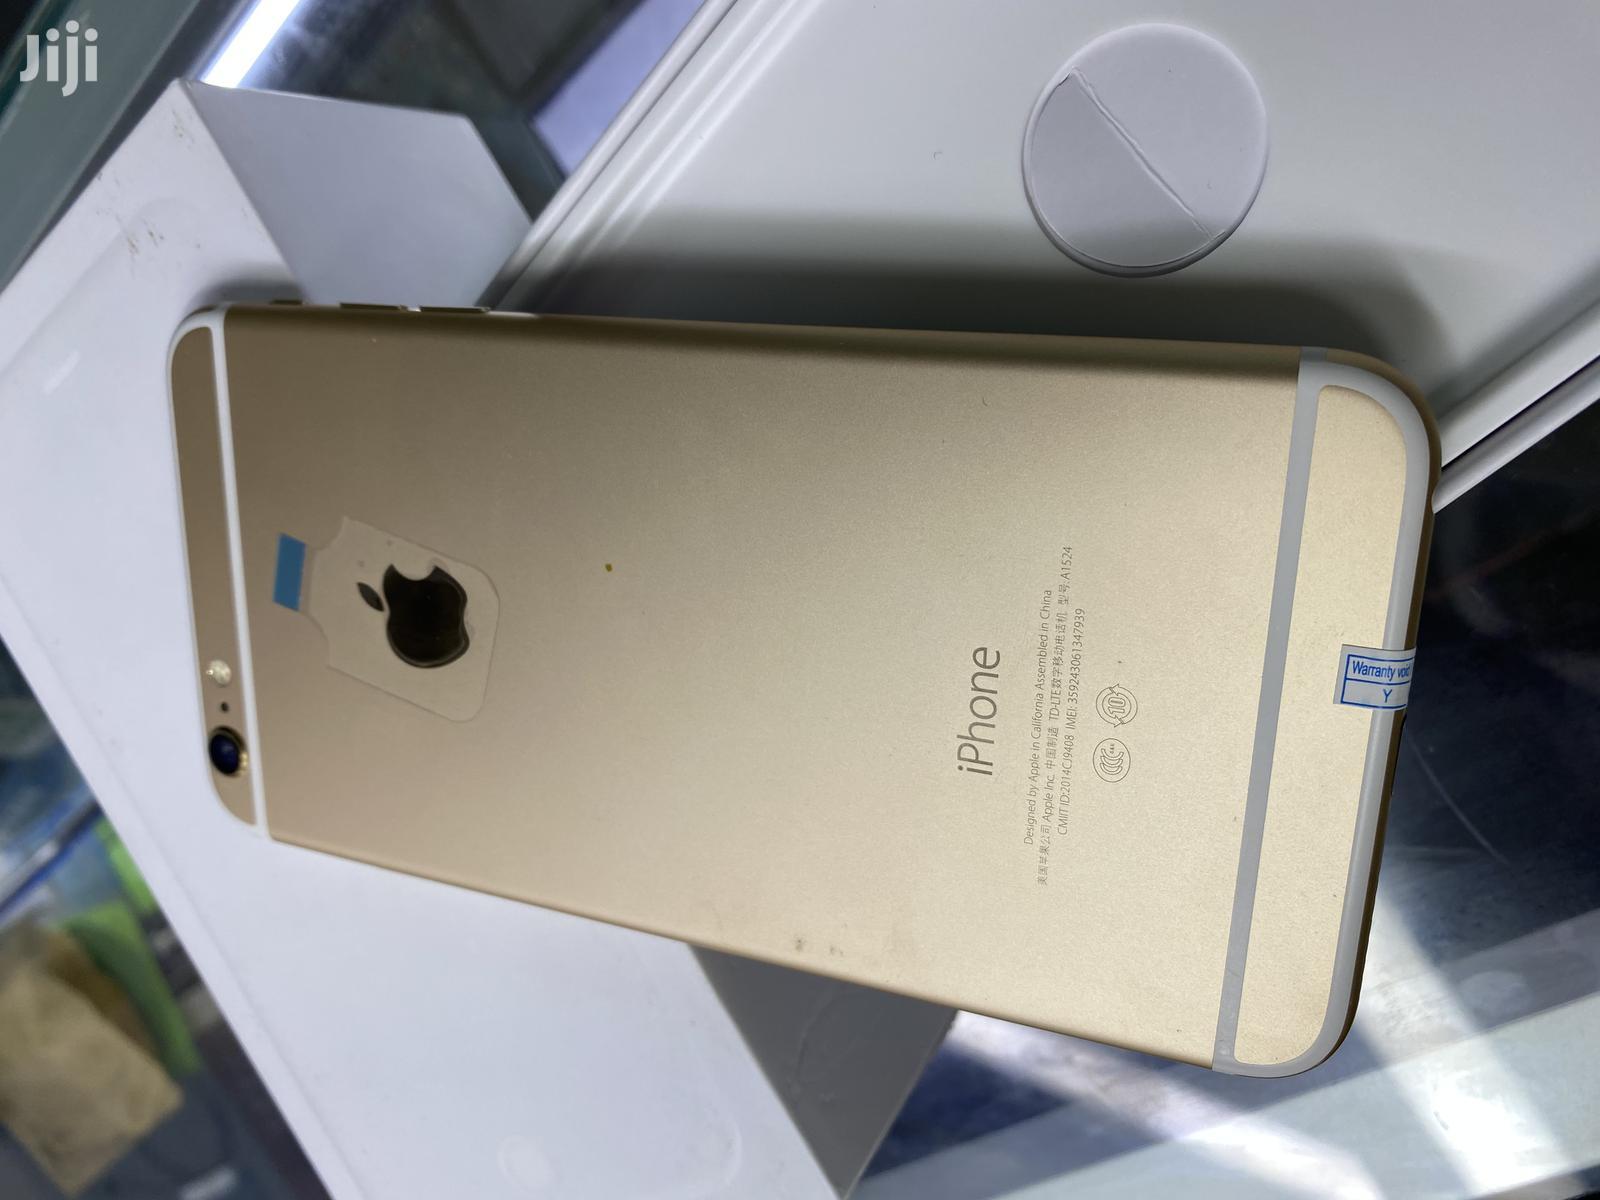 Apple iPhone 6 Plus 16 GB Gold   Mobile Phones for sale in Nairobi Central, Nairobi, Kenya